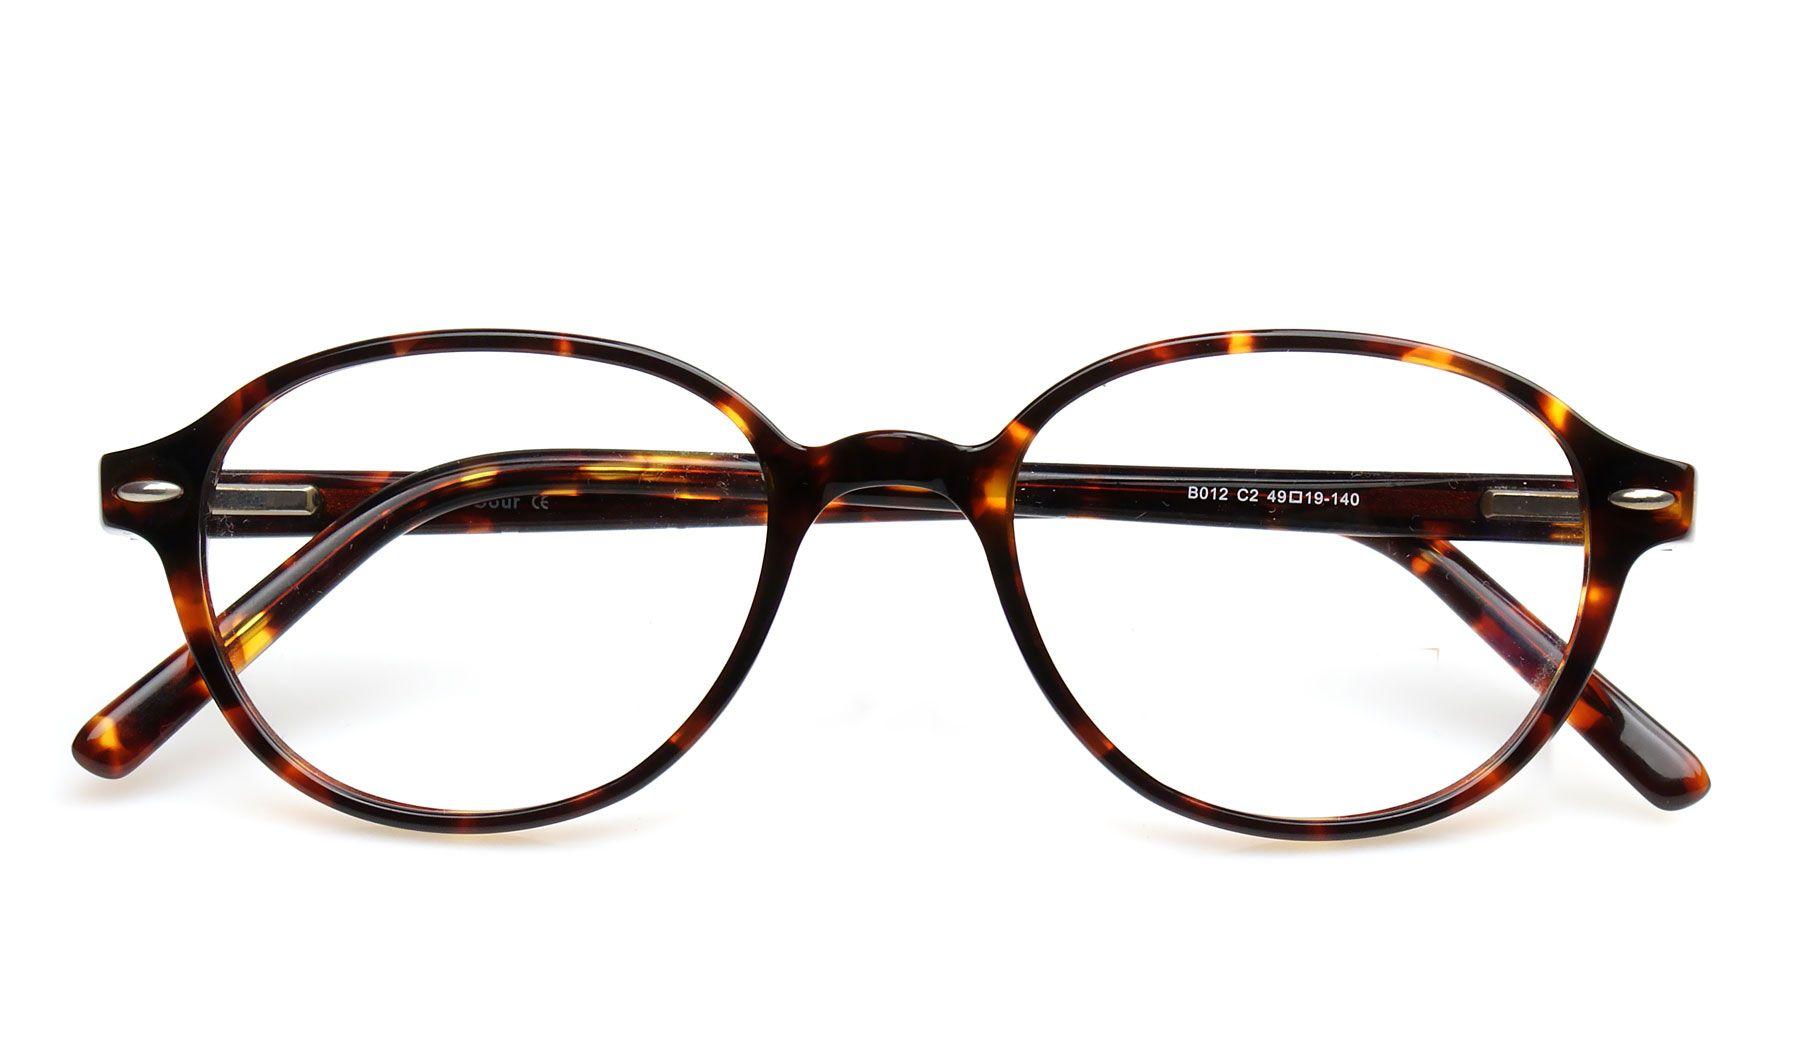 fe82585b9e Barbour glasses